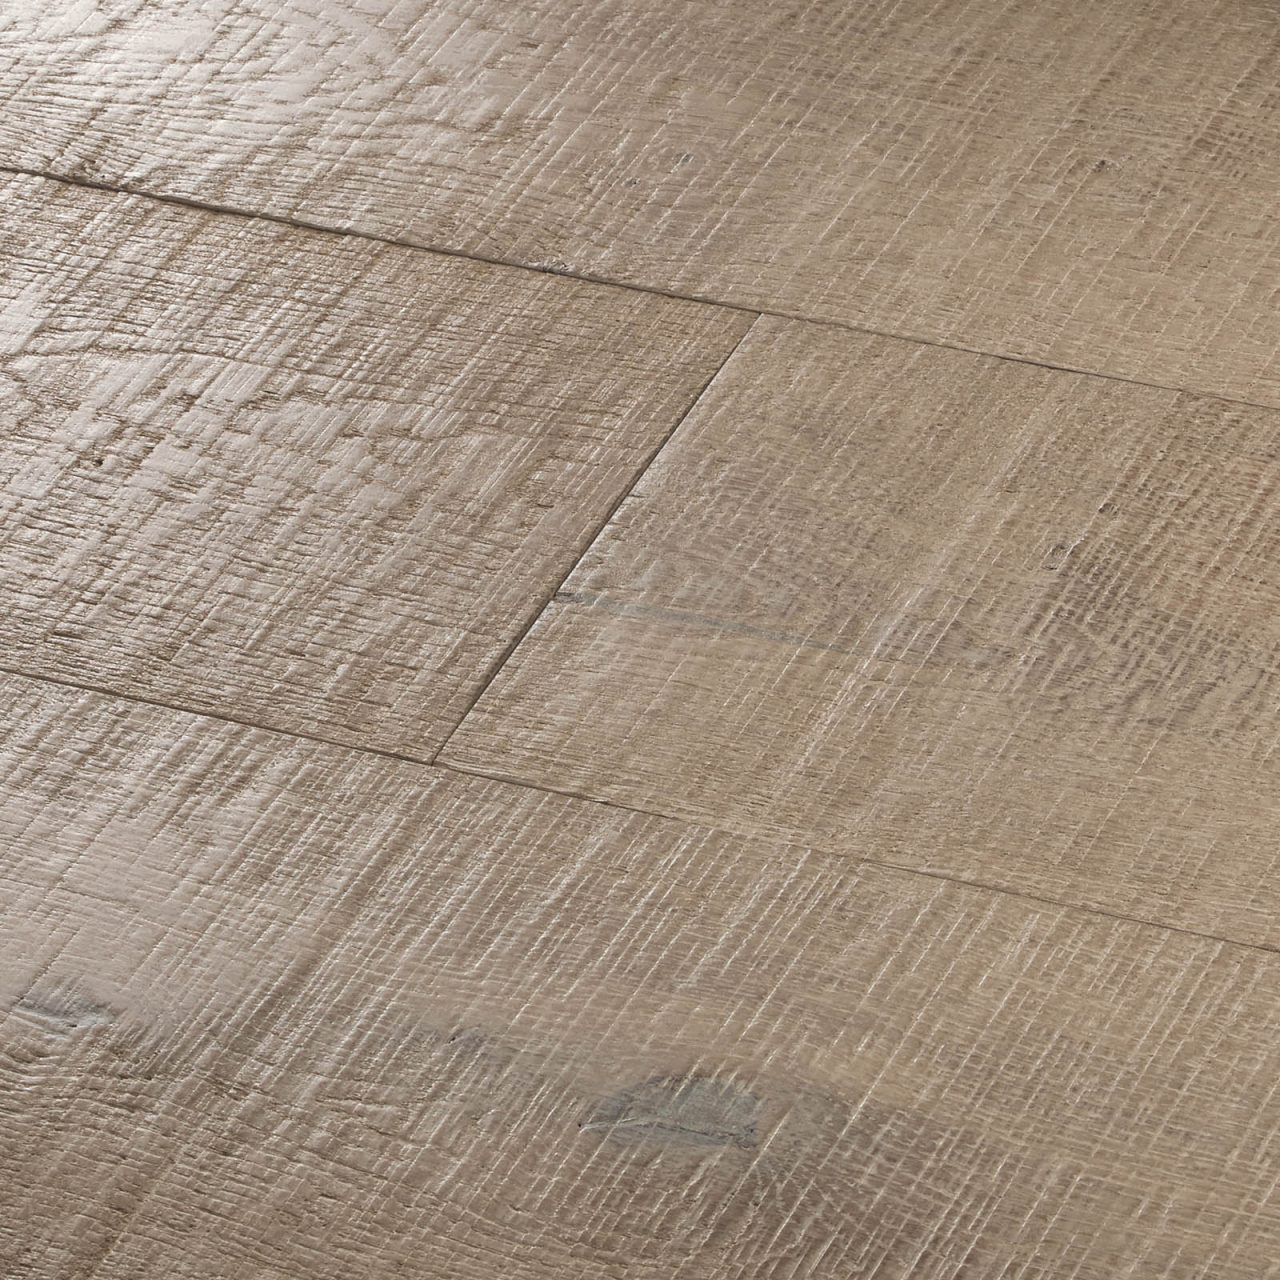 Woodpecker Flooring Engineered Oak chepstow sawn grey